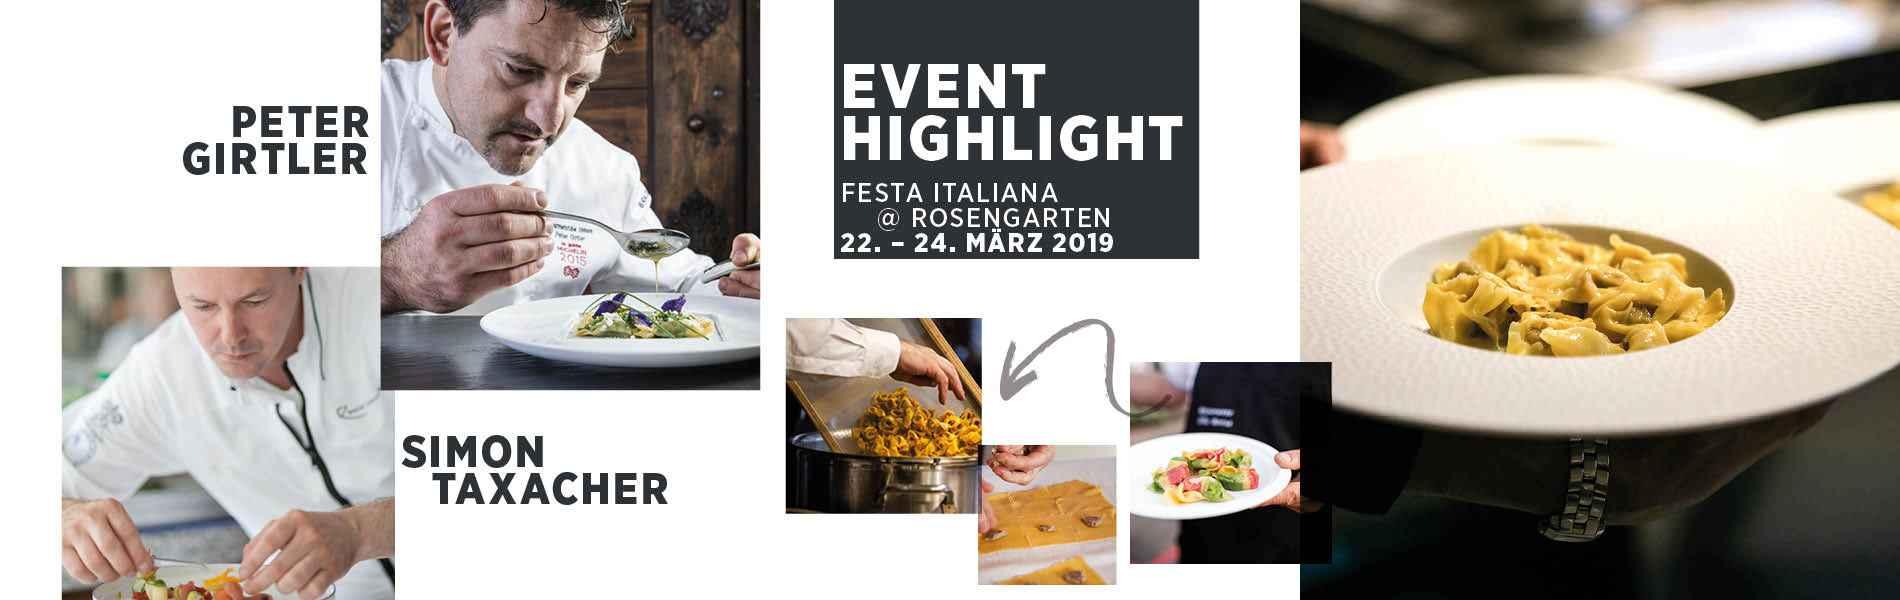 EVENT HIGHLIGHT Simon Taxacher und Peter Girtler im 5-Sterne-Hotel Relais Chateaux Rosengarten Tirol Austria